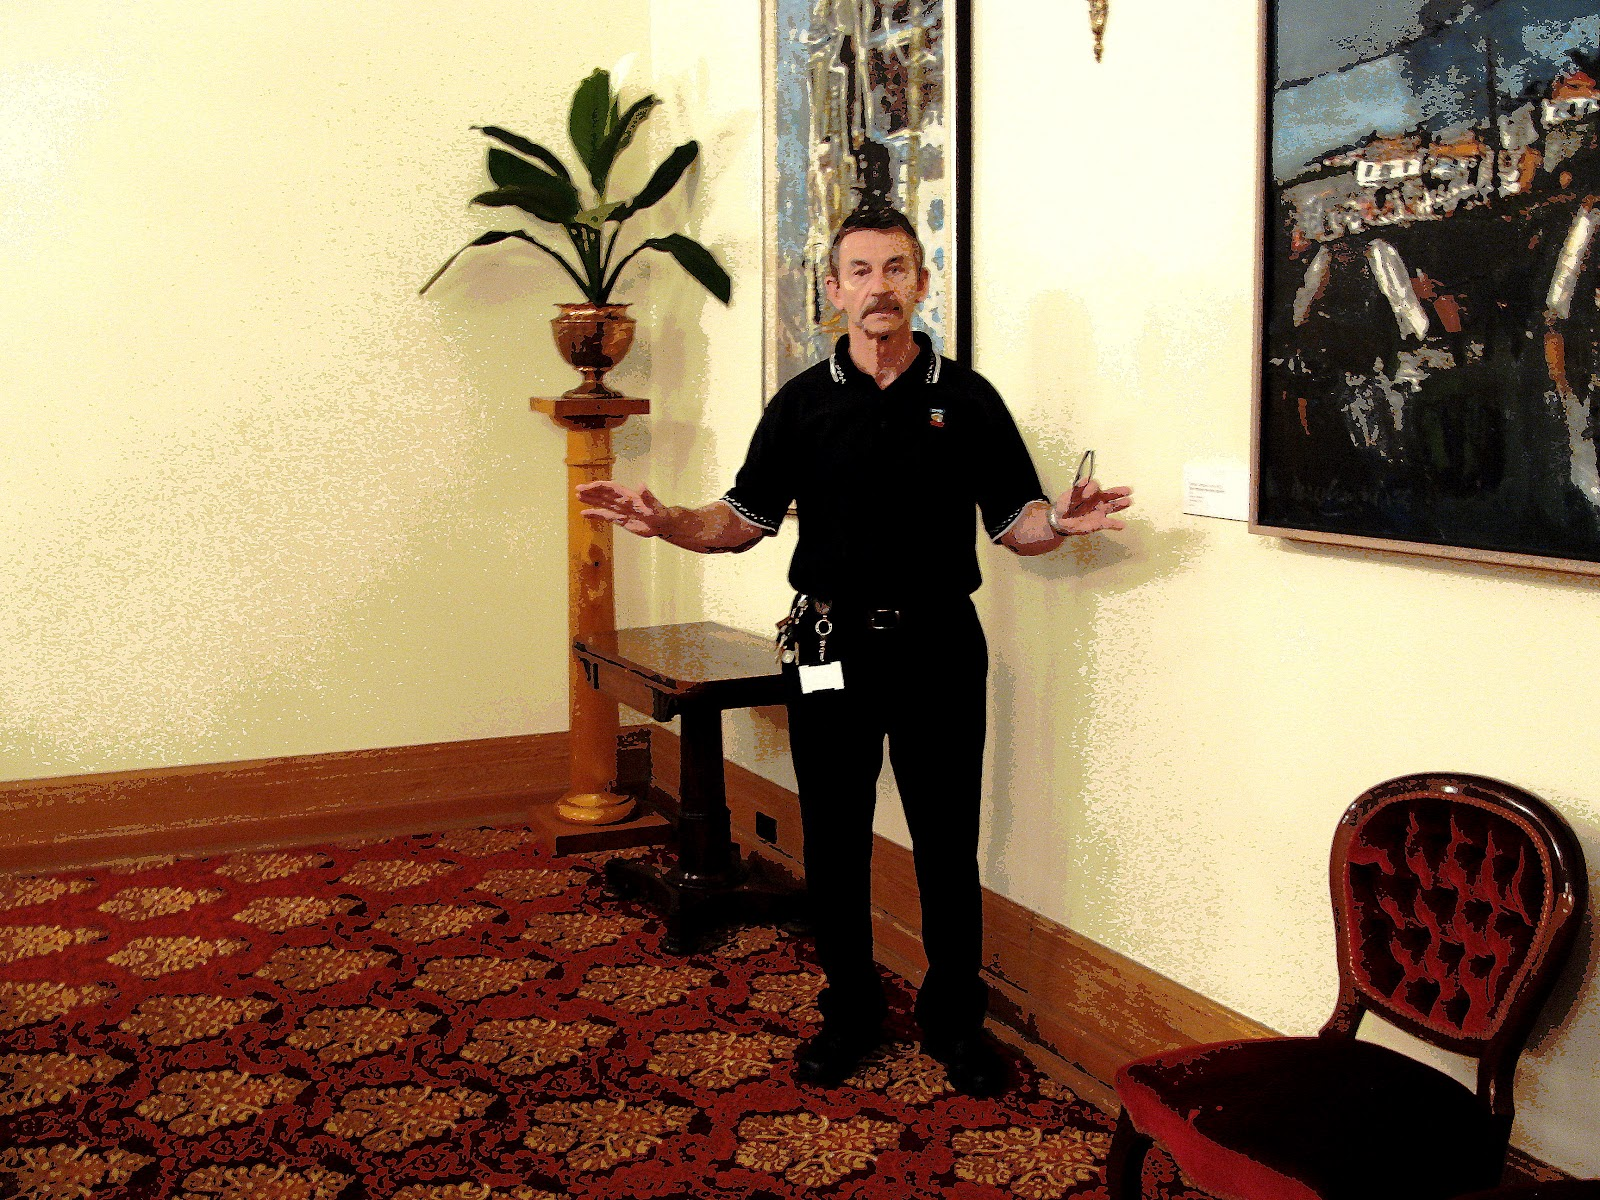 Mr Mike Lonergan Hobart Town Hall keeper 2012